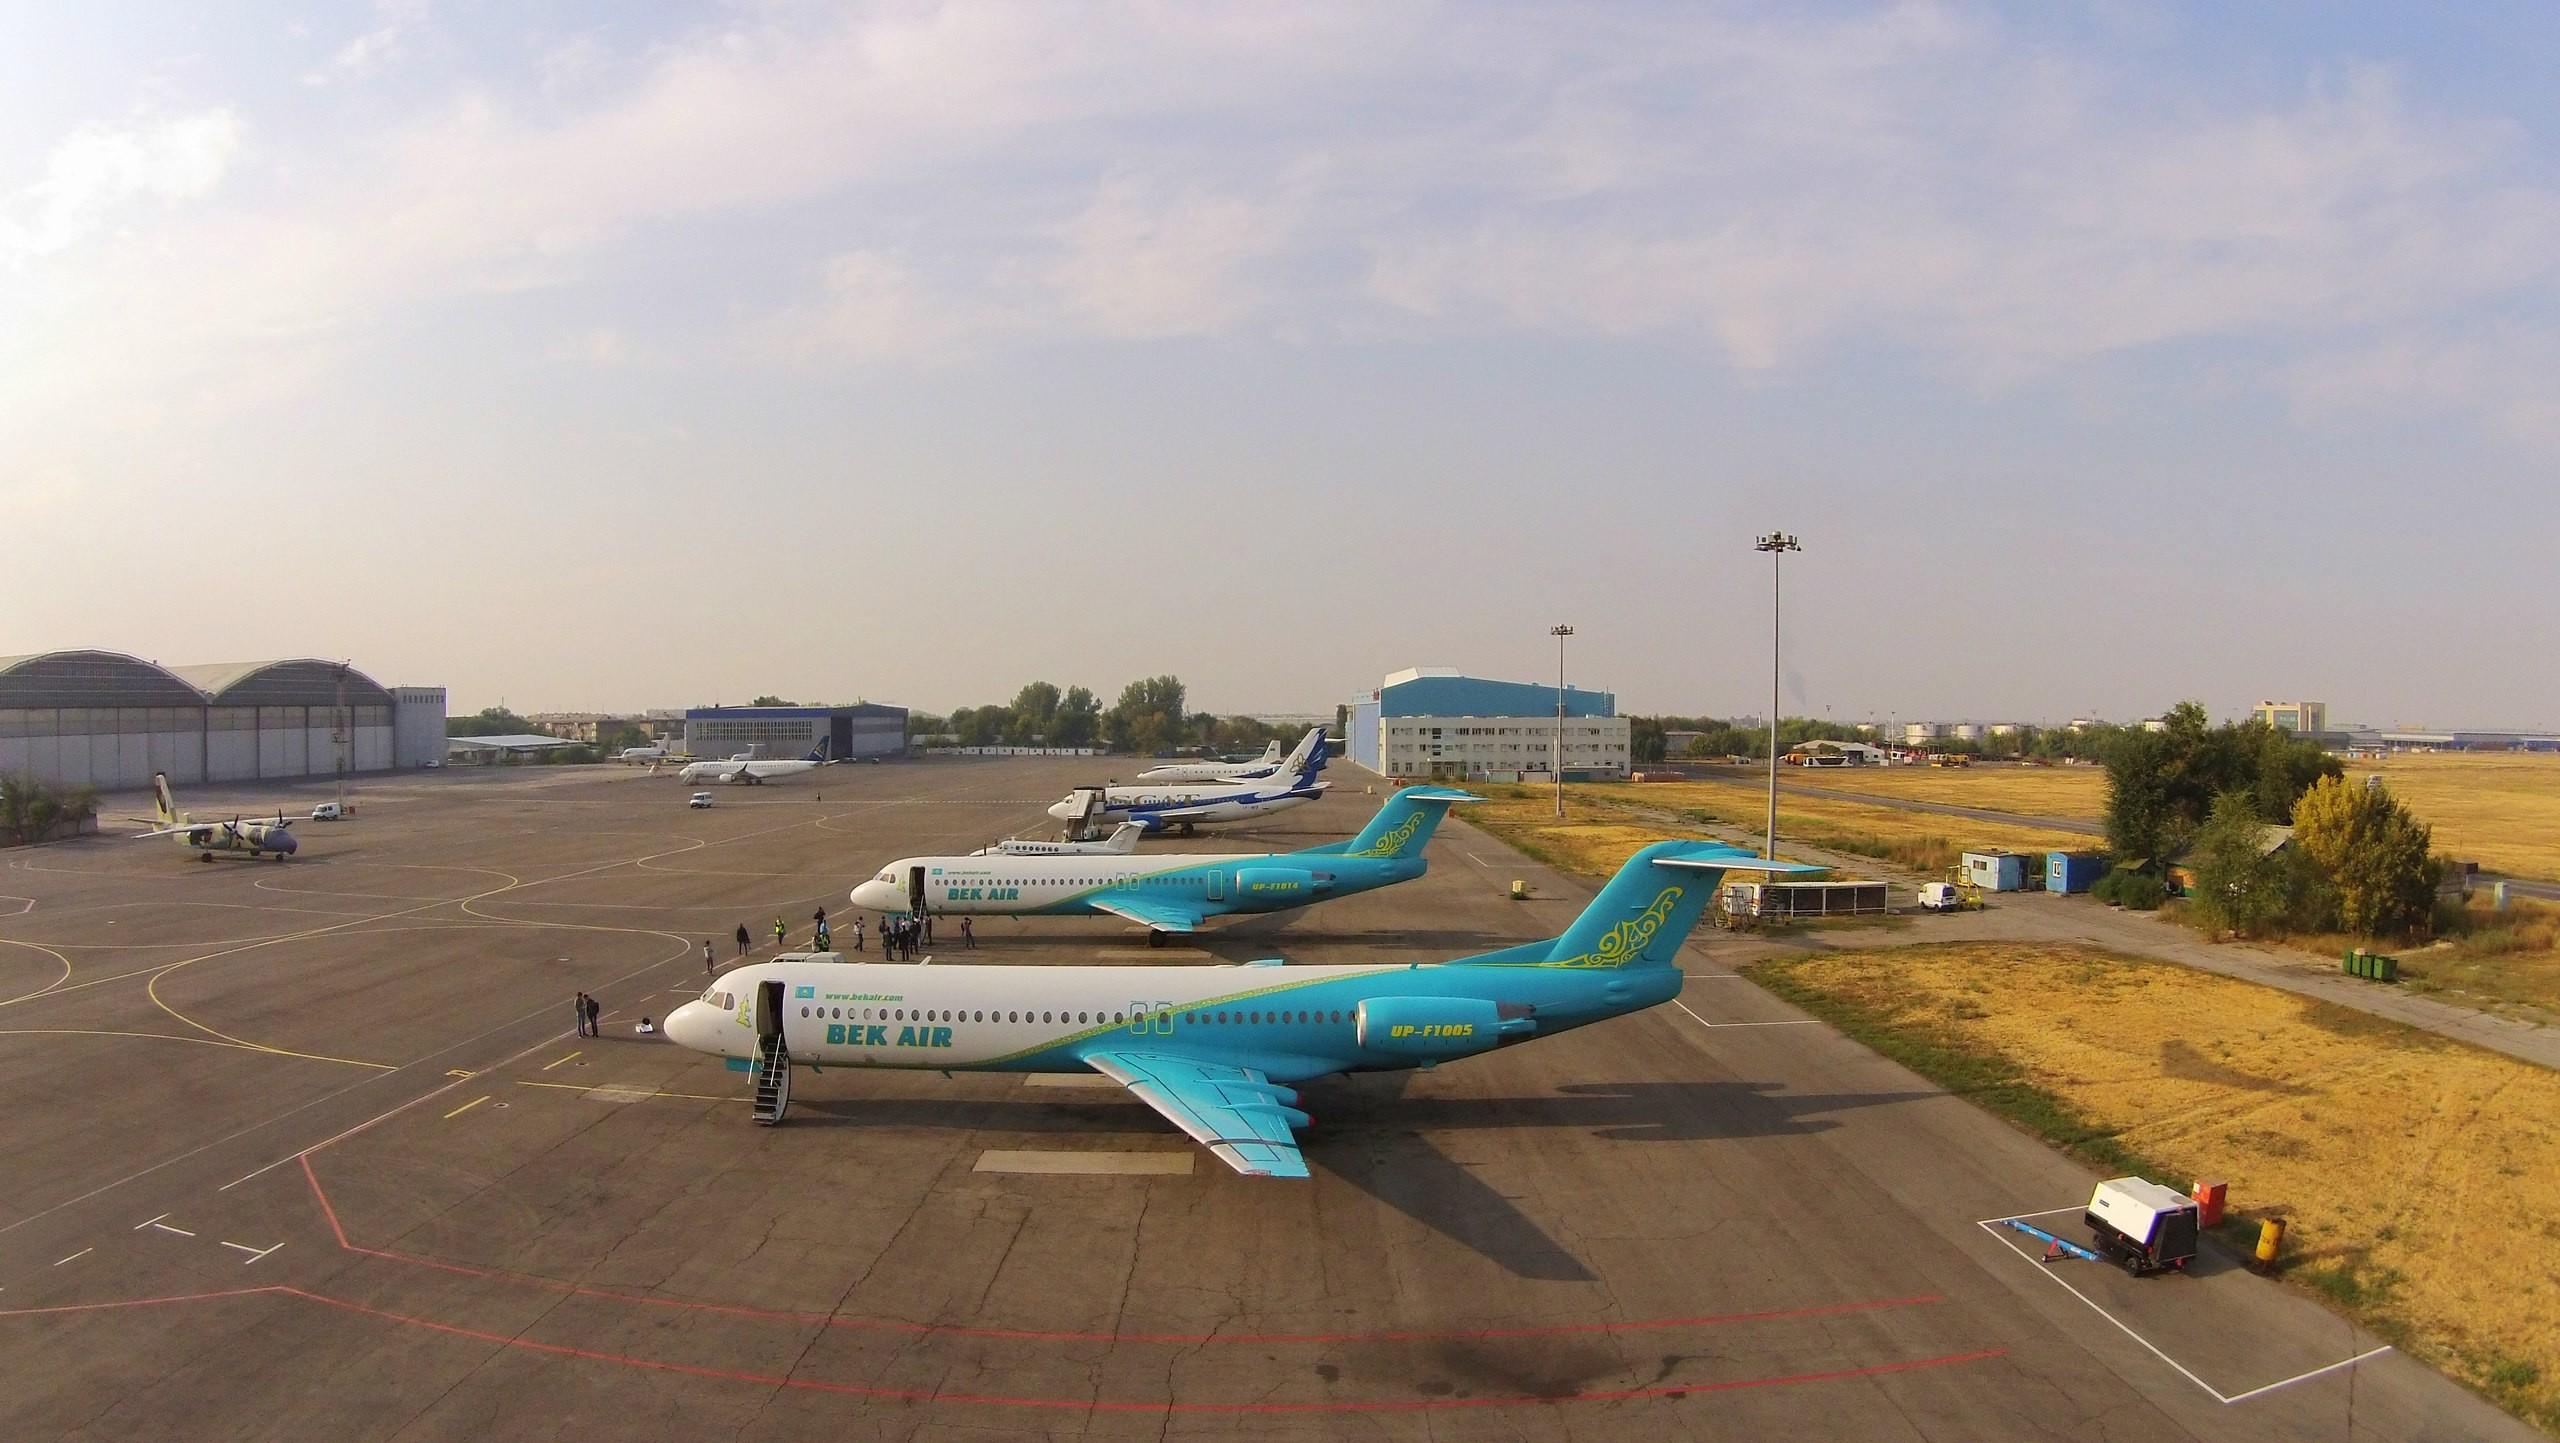 Фото © Авиакомпания Bek Air